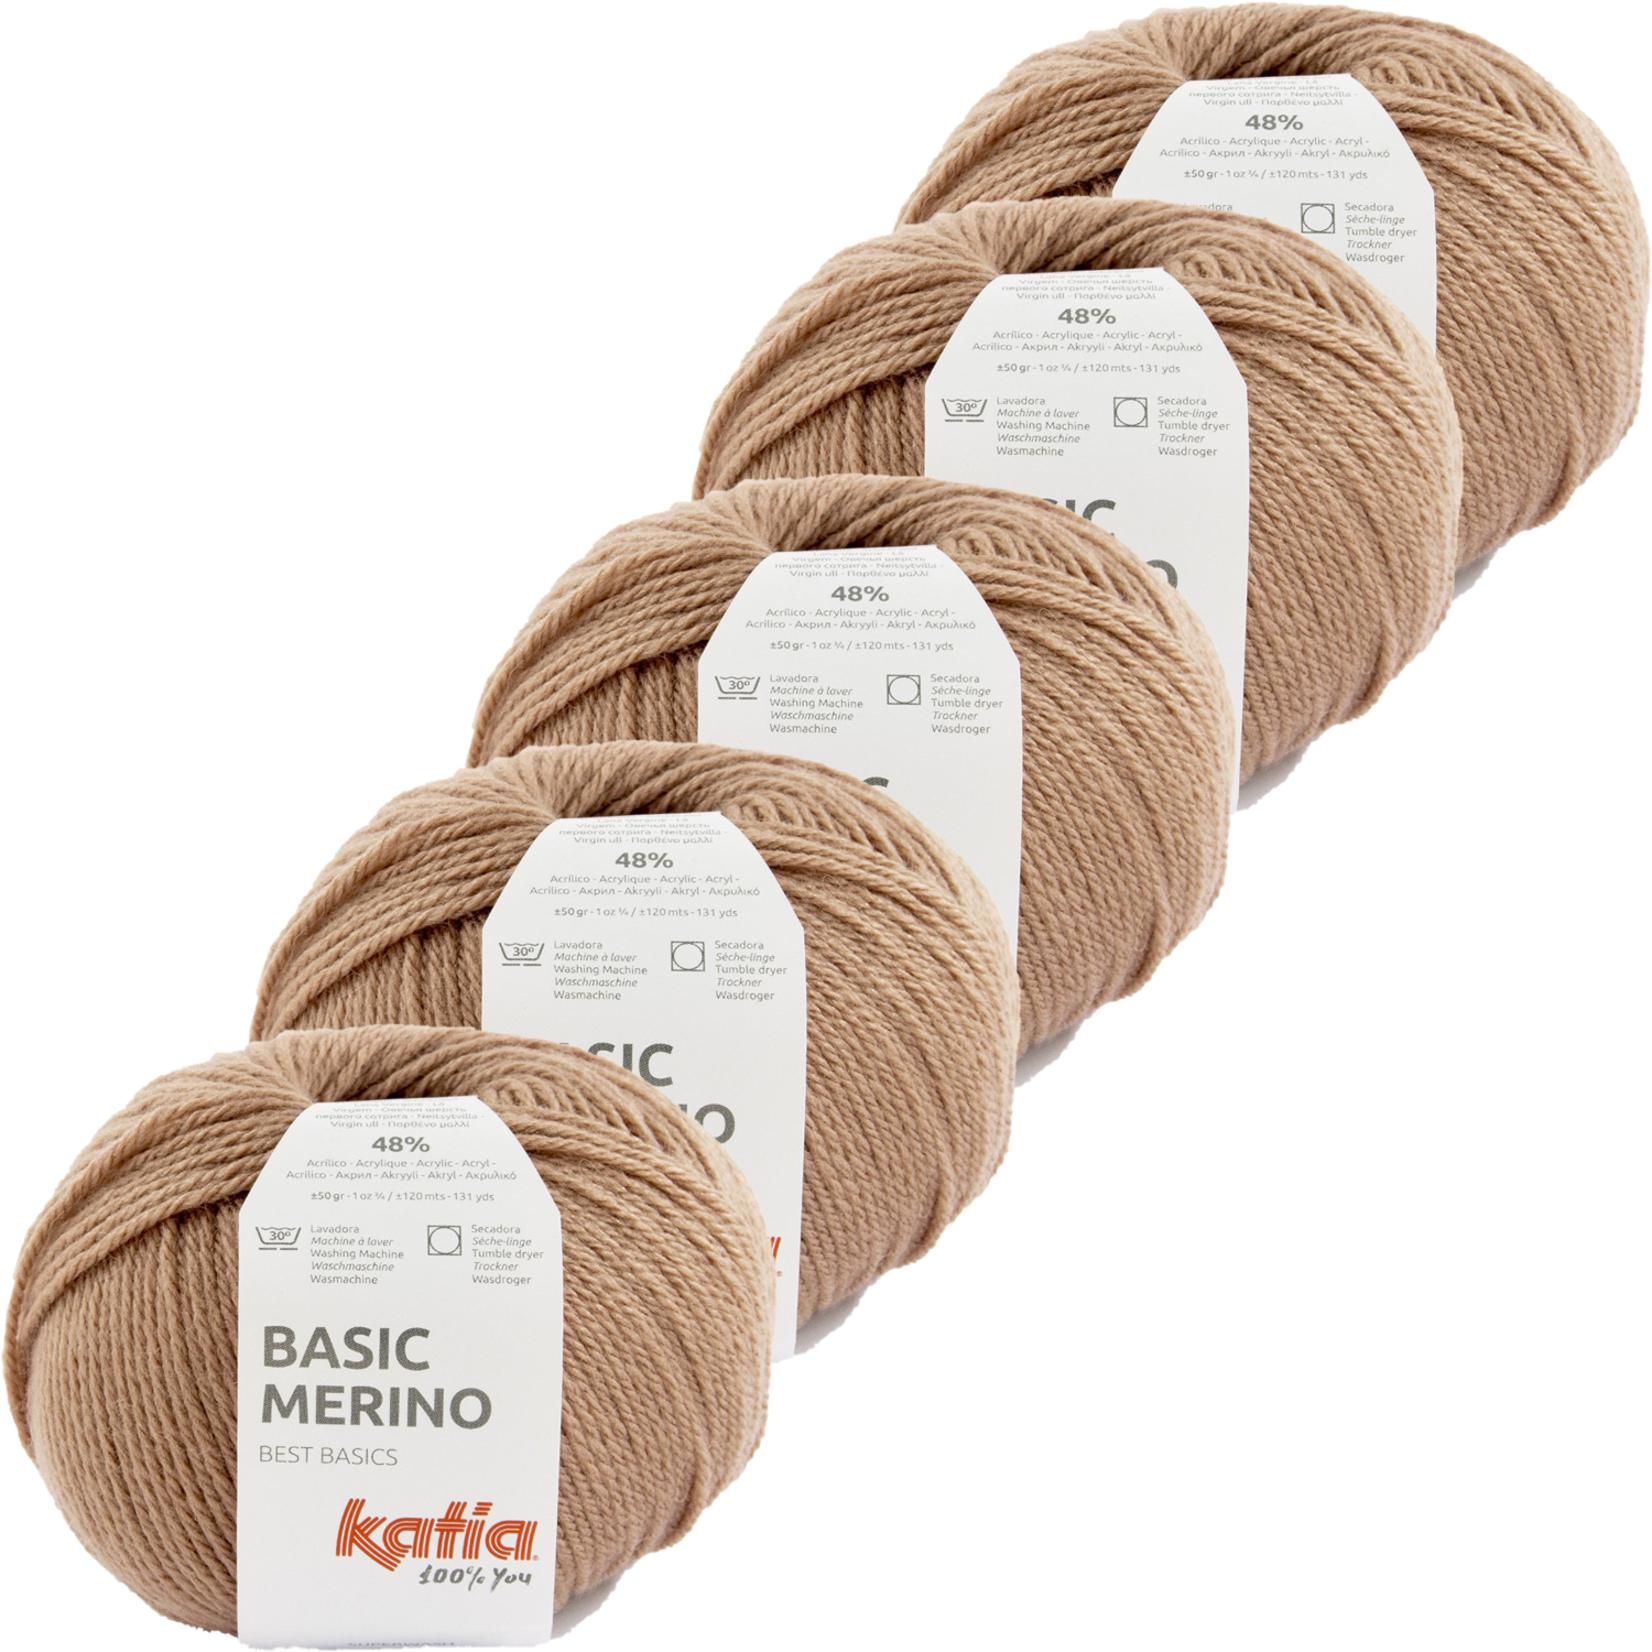 Katia Basic Merino - kleur 88_Terrabruin - bundel 5 bollen 50 gr.  van 120 m.